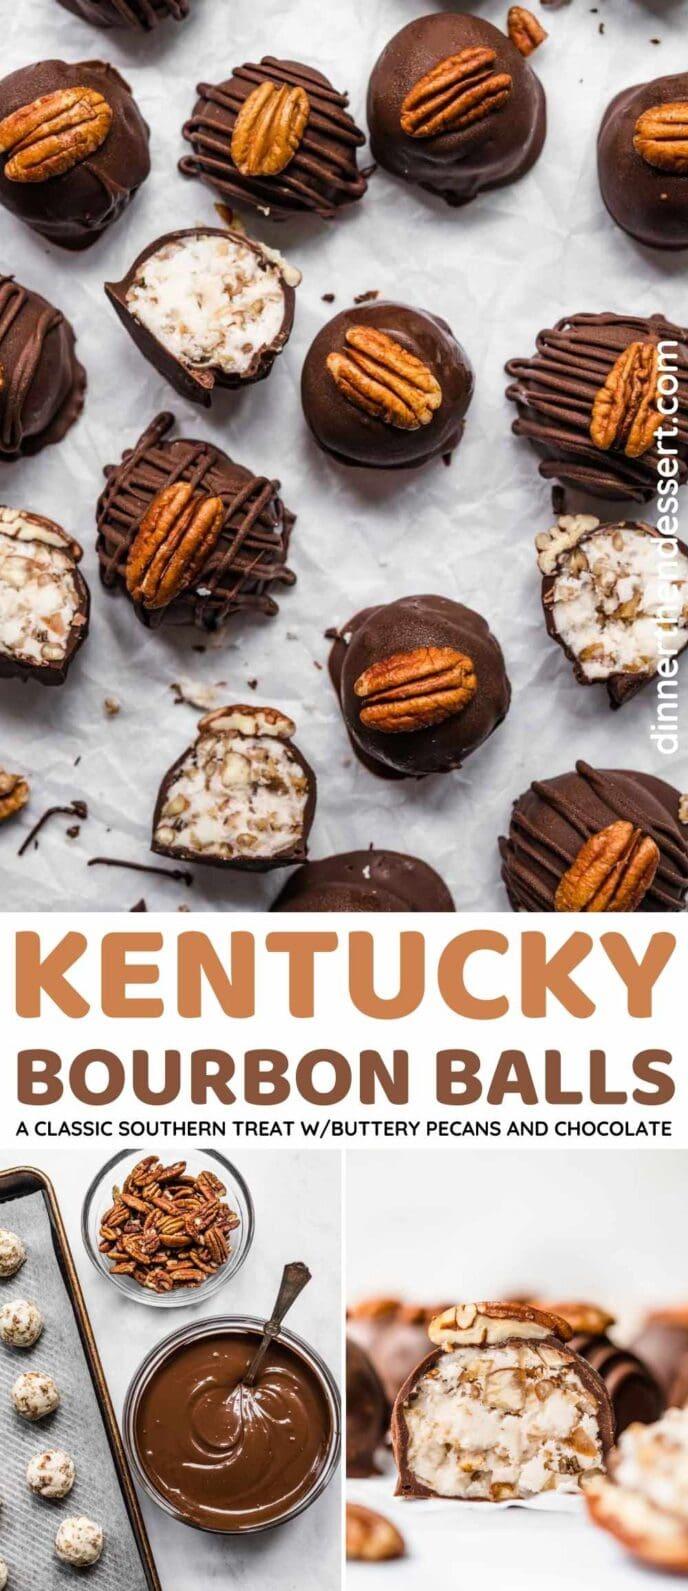 Kentucky Bourbon Balls Collage